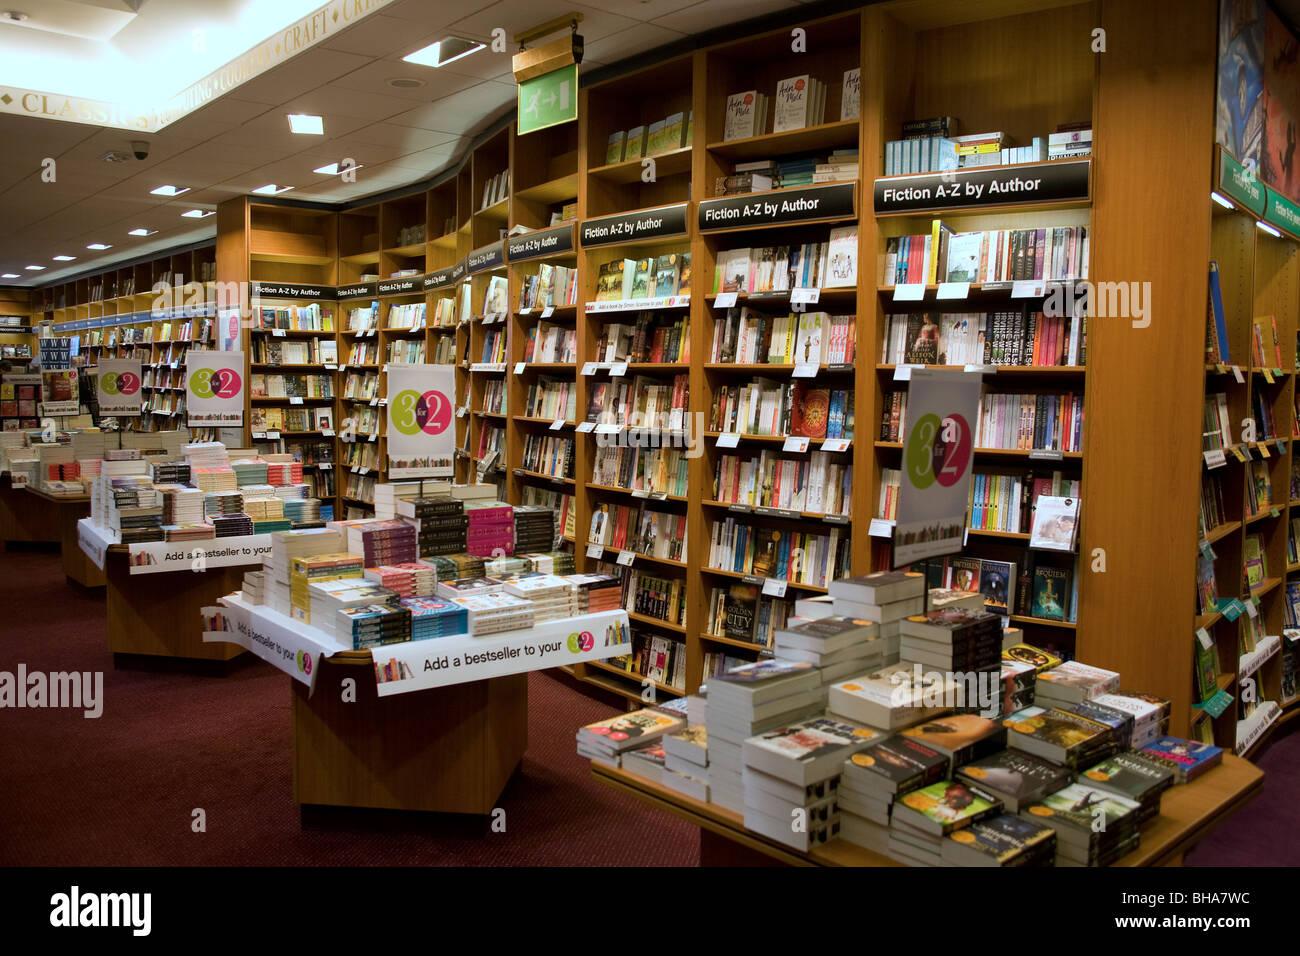 Waterstone's Bookshop - Stock Image